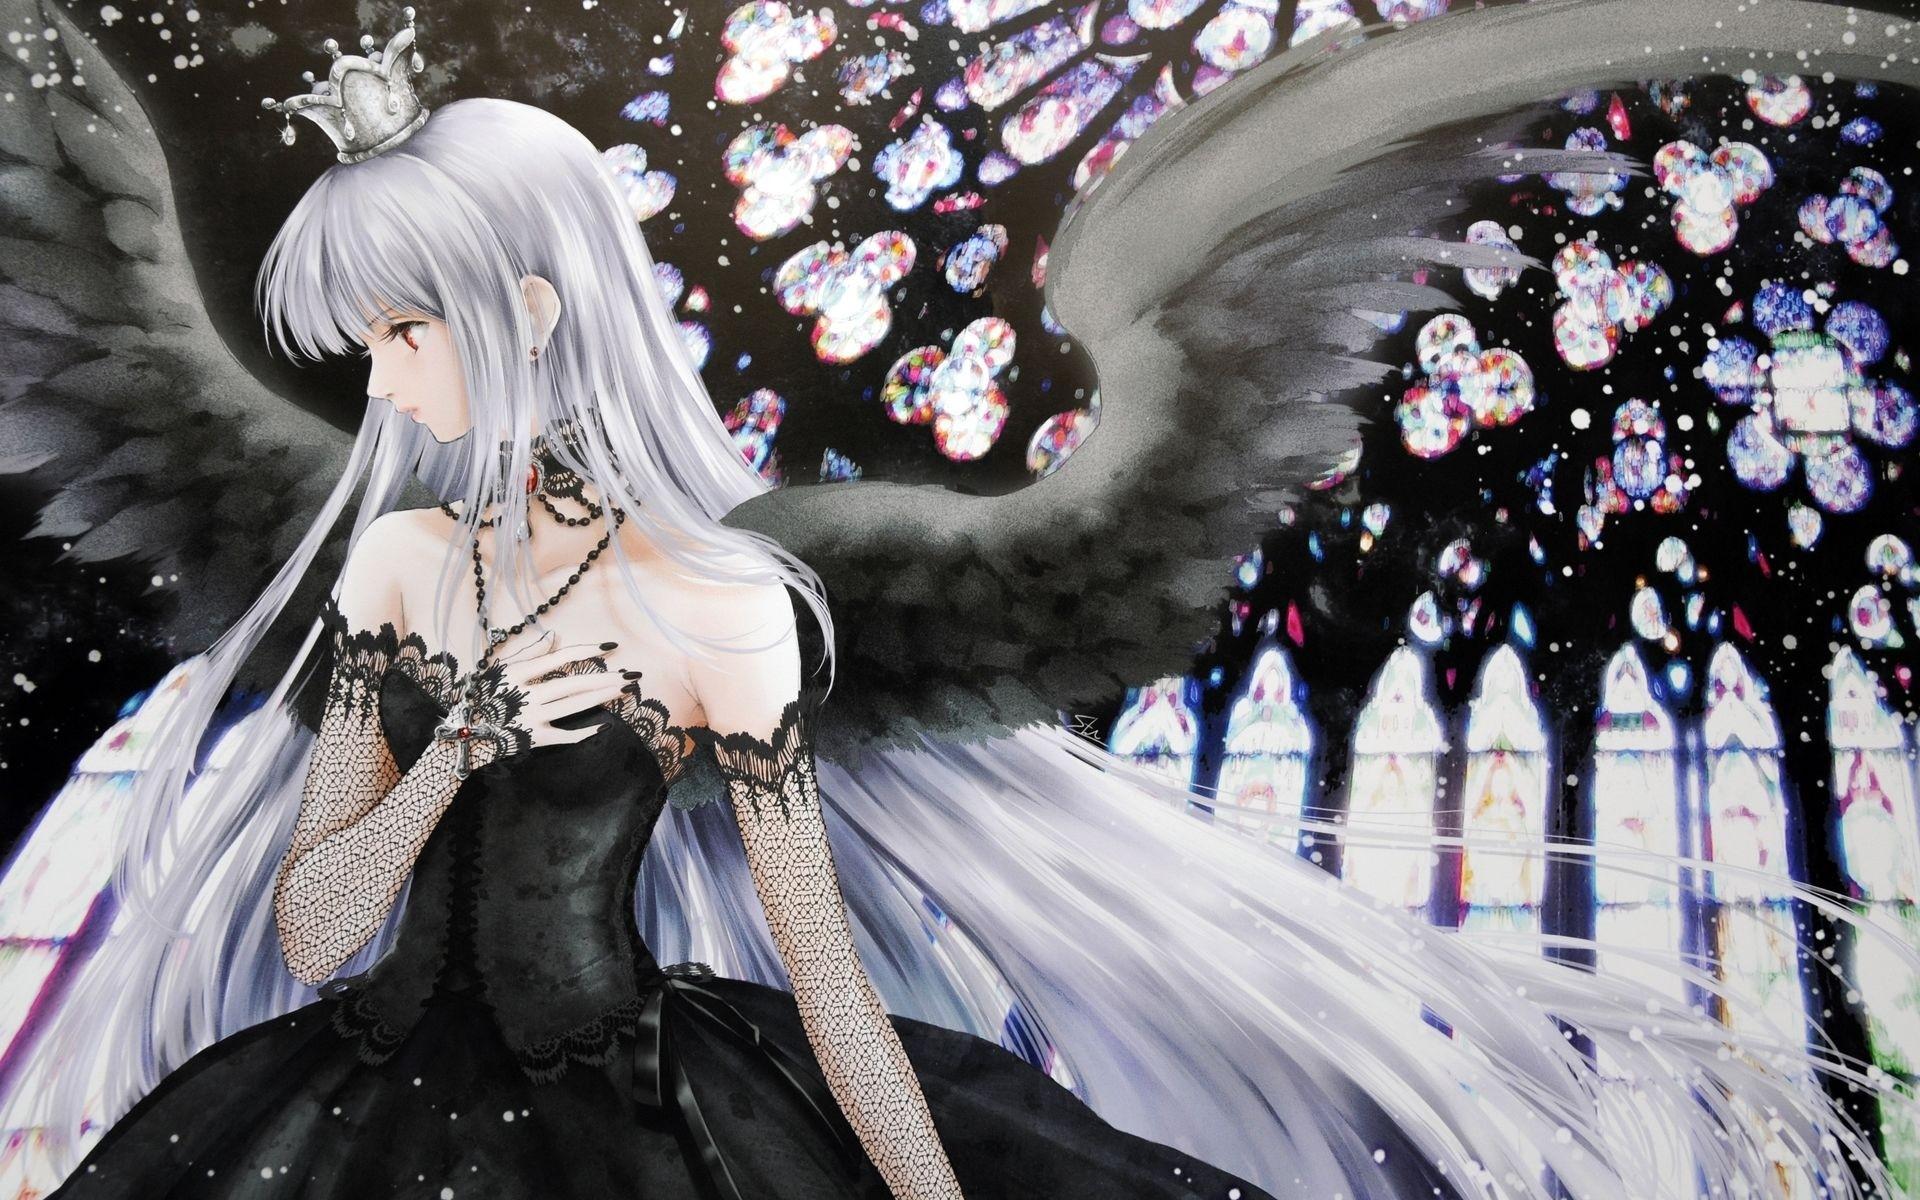 Anime Glitter Force Wallpaper – WallpaperSafari